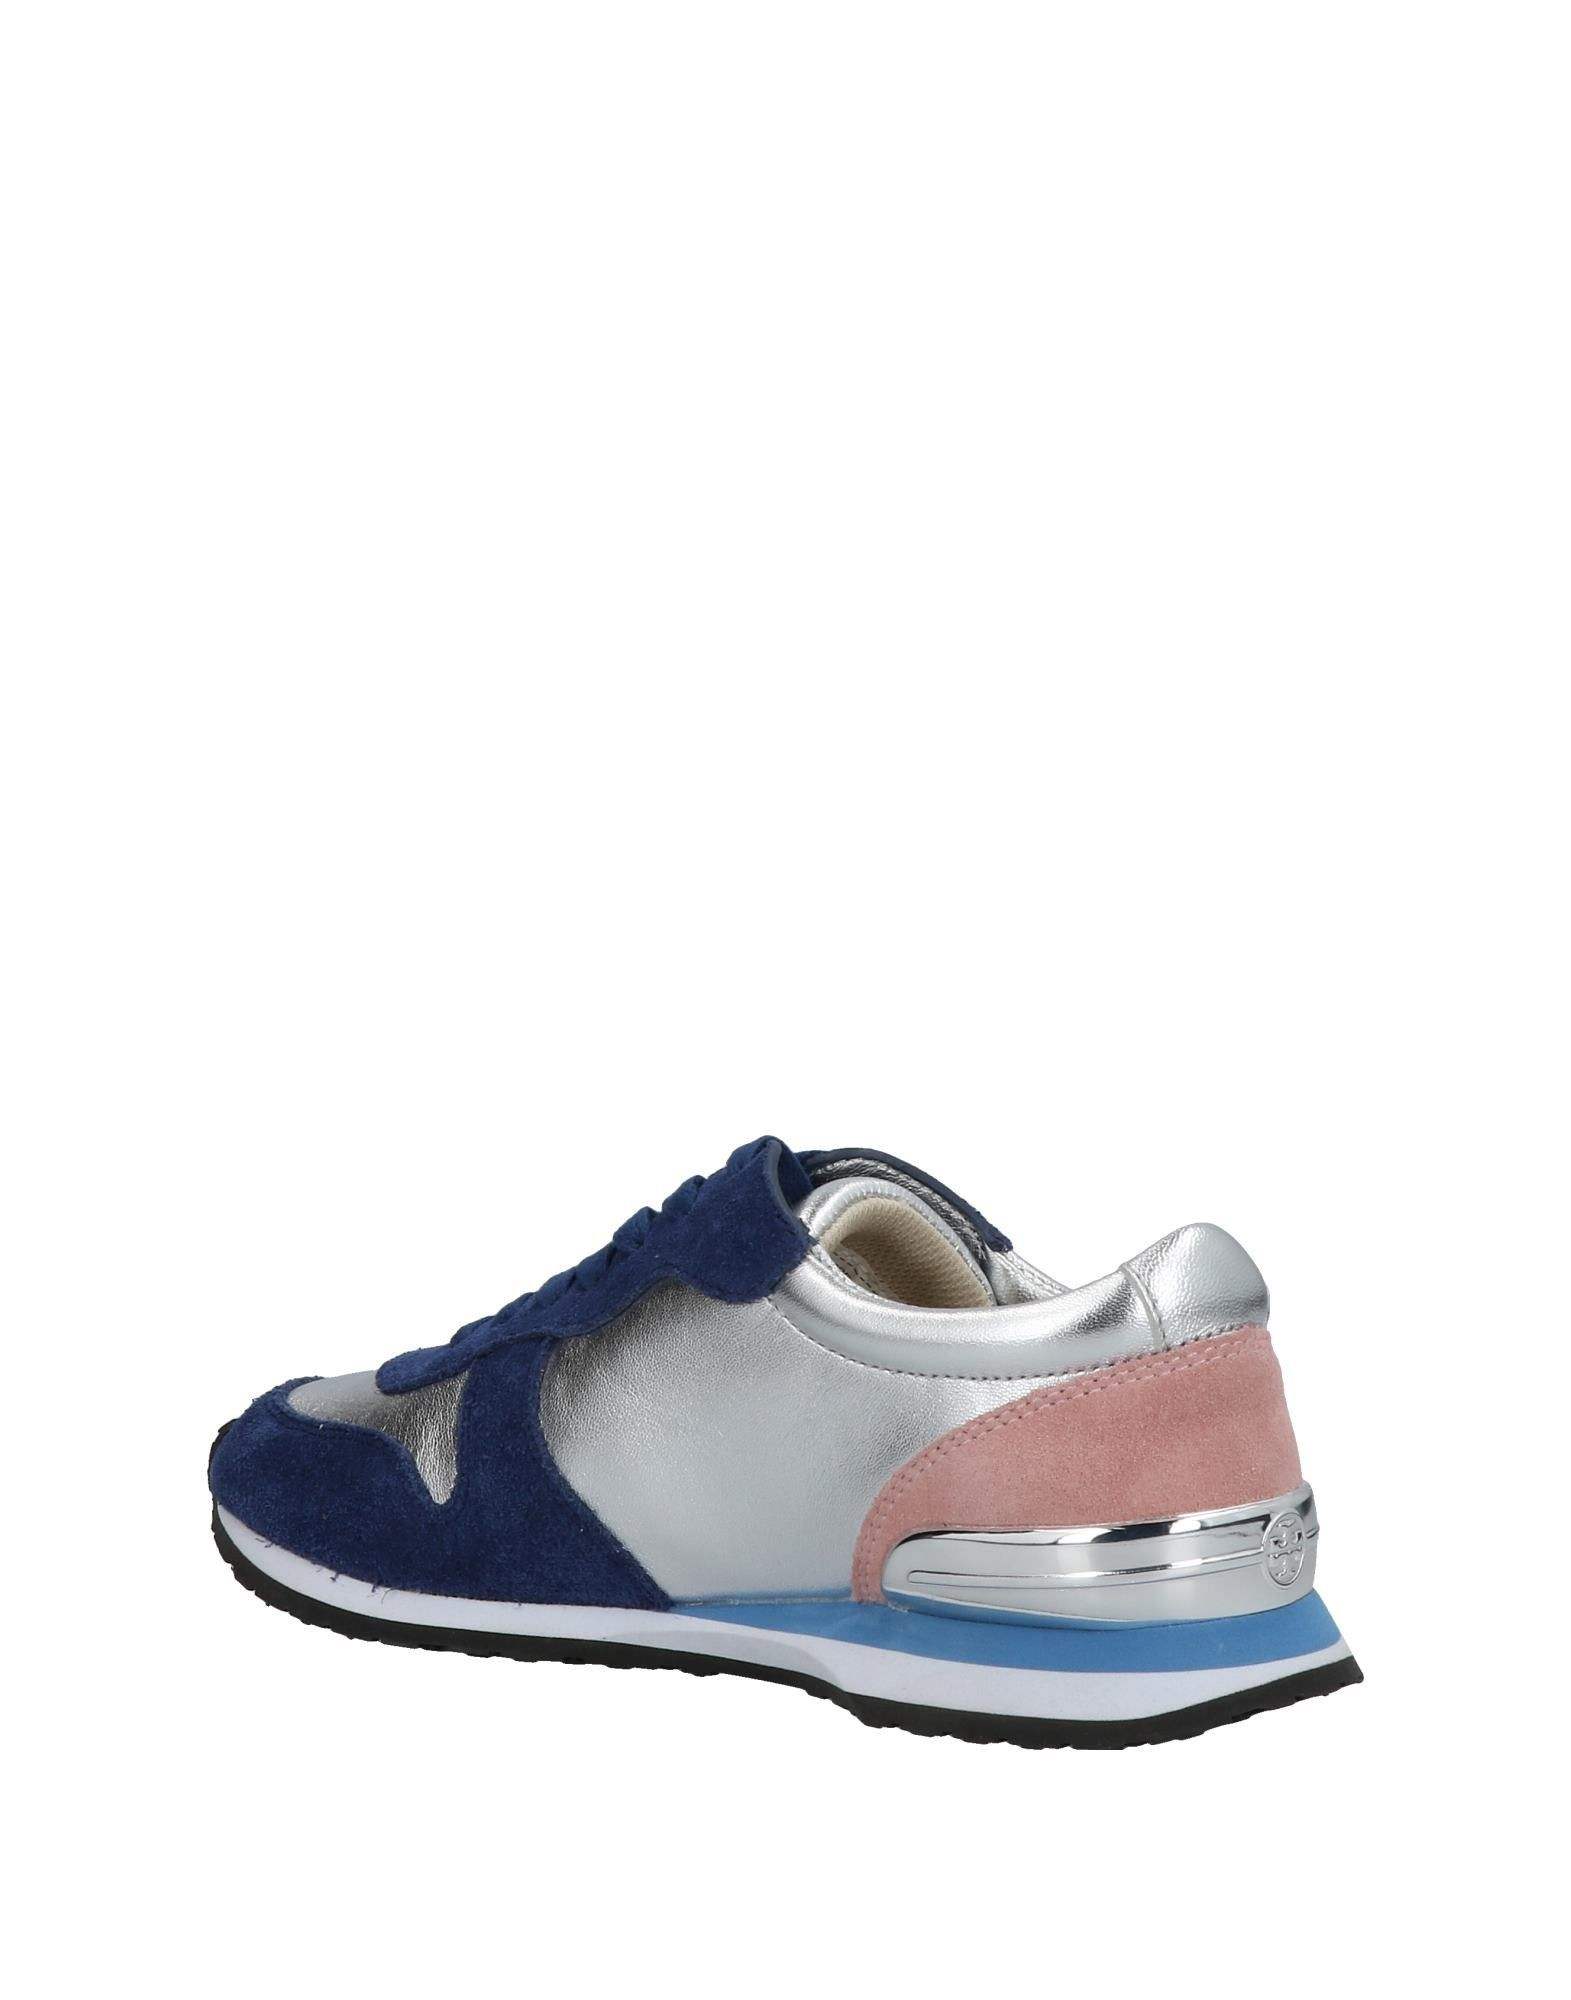 Stilvolle billige Schuhe Tory Burch 11429610NW Sneakers Damen  11429610NW Burch a5a32d